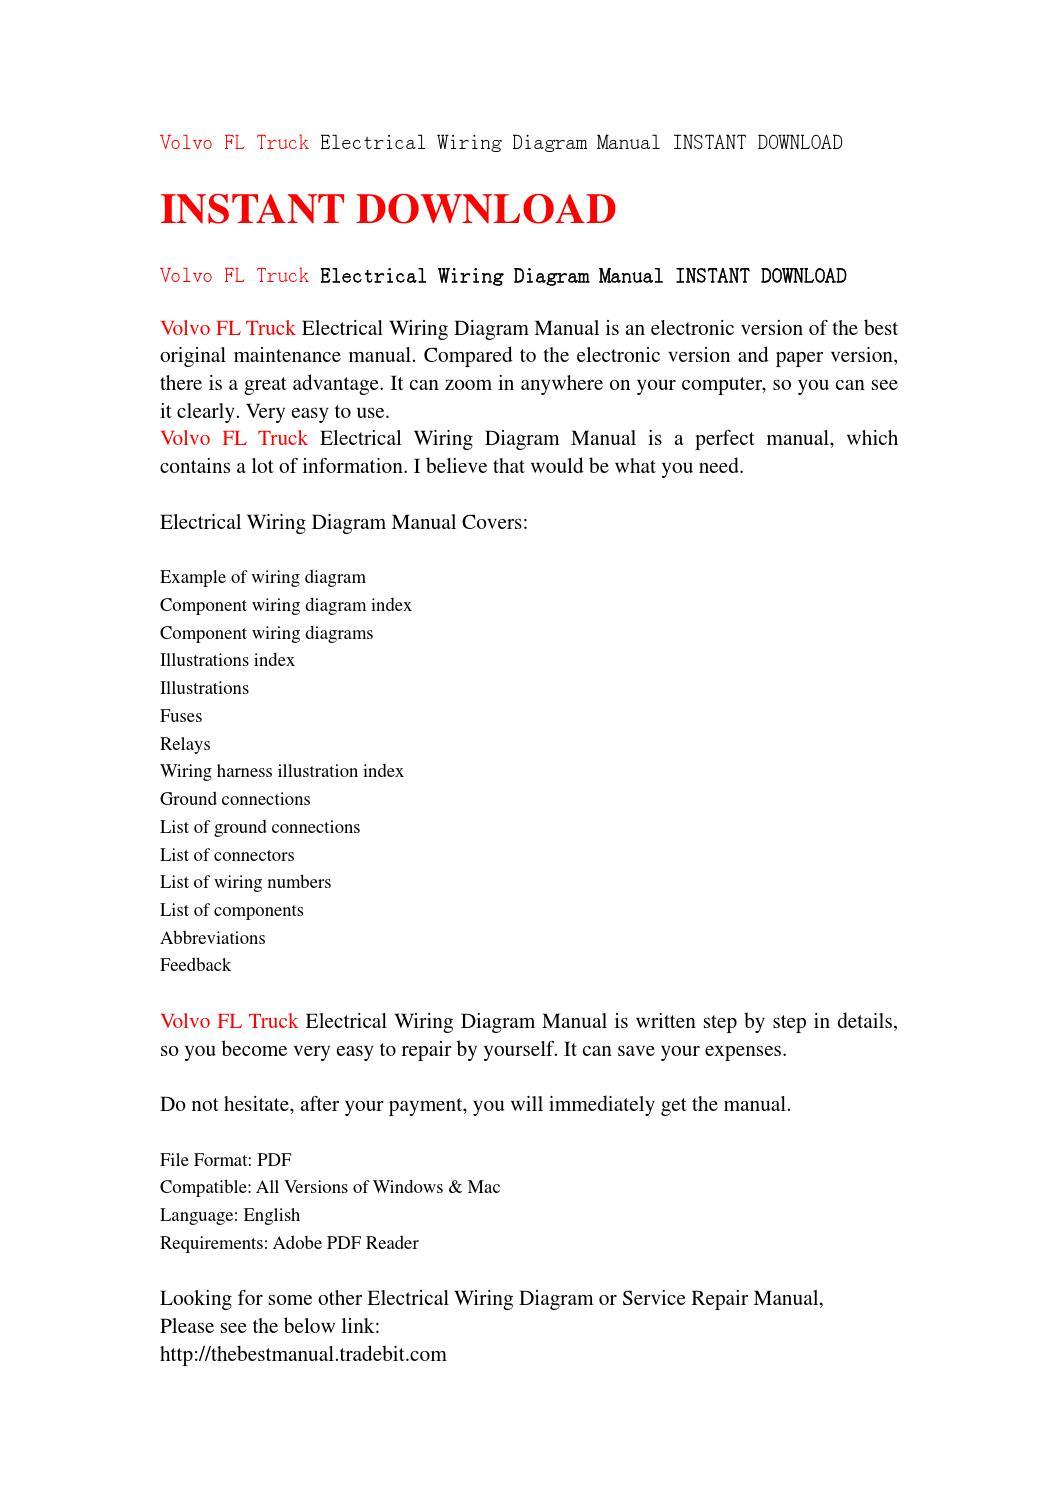 Volvo Fl Truck Electrical Wiring Diagram Manual Instant Download By Abbreviations Jjfhsjnn Issuu